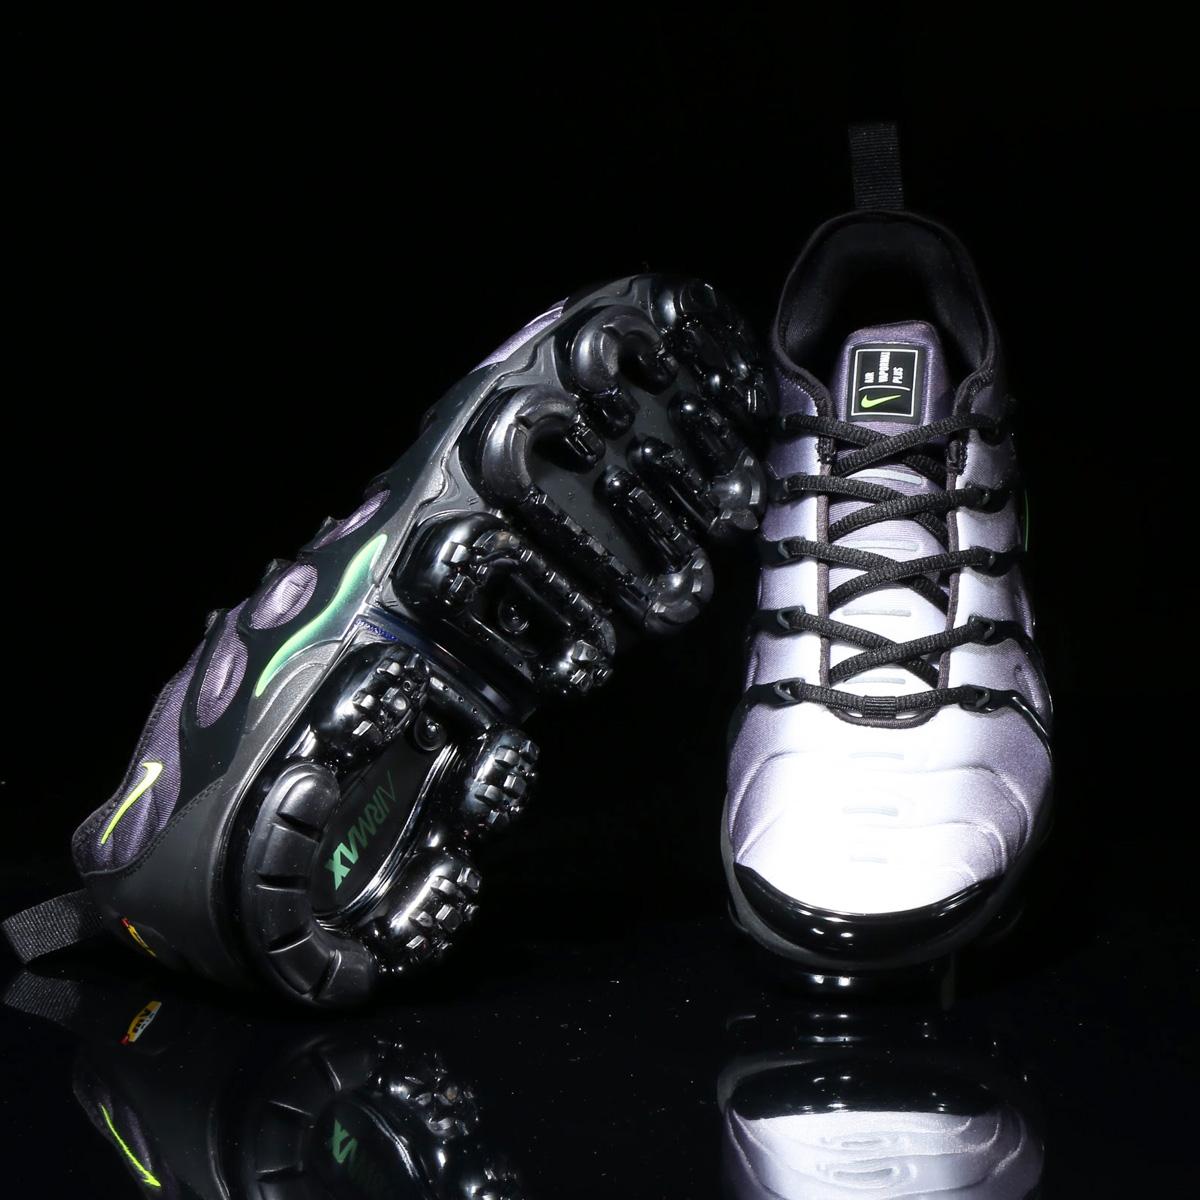 NIKE AIR VAPORMAX PLUS (ナイキ エア ベイパーマックス プラス) BLACK/VOLT-WHITE【メンズ レディース スニーカー】18SU-S